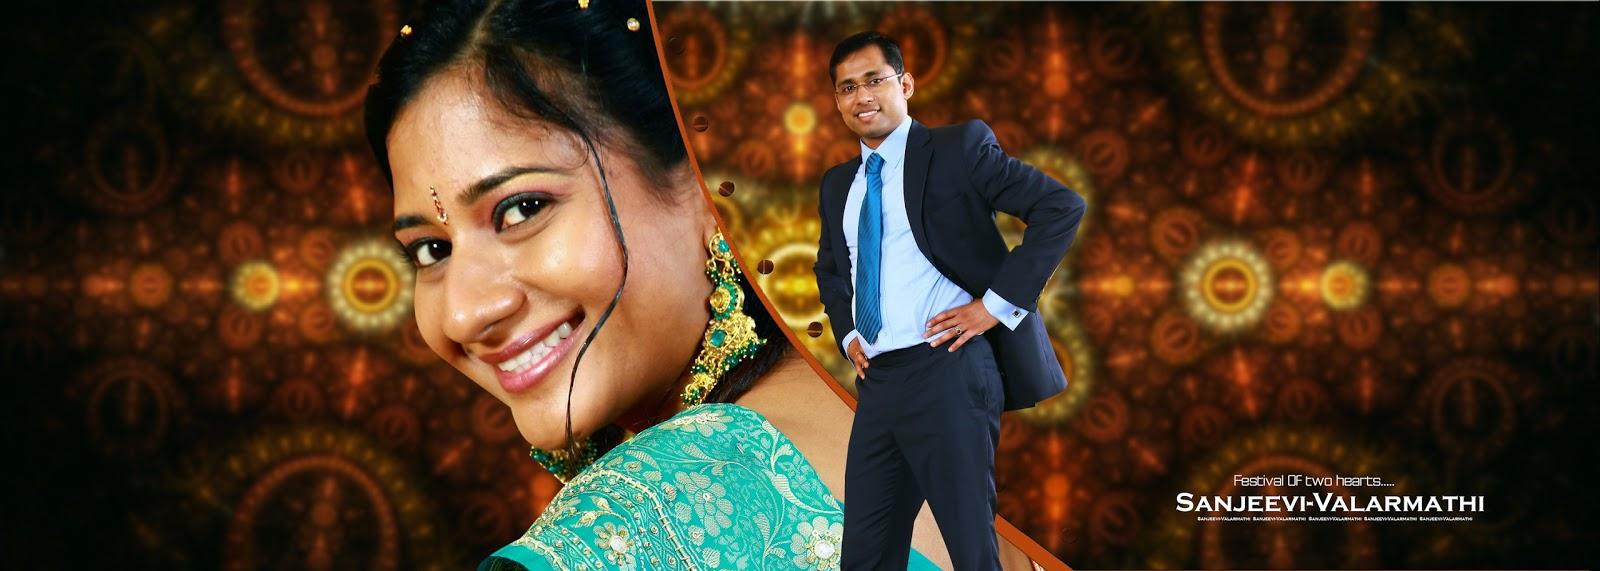 chennai wedding album designing service all nations the